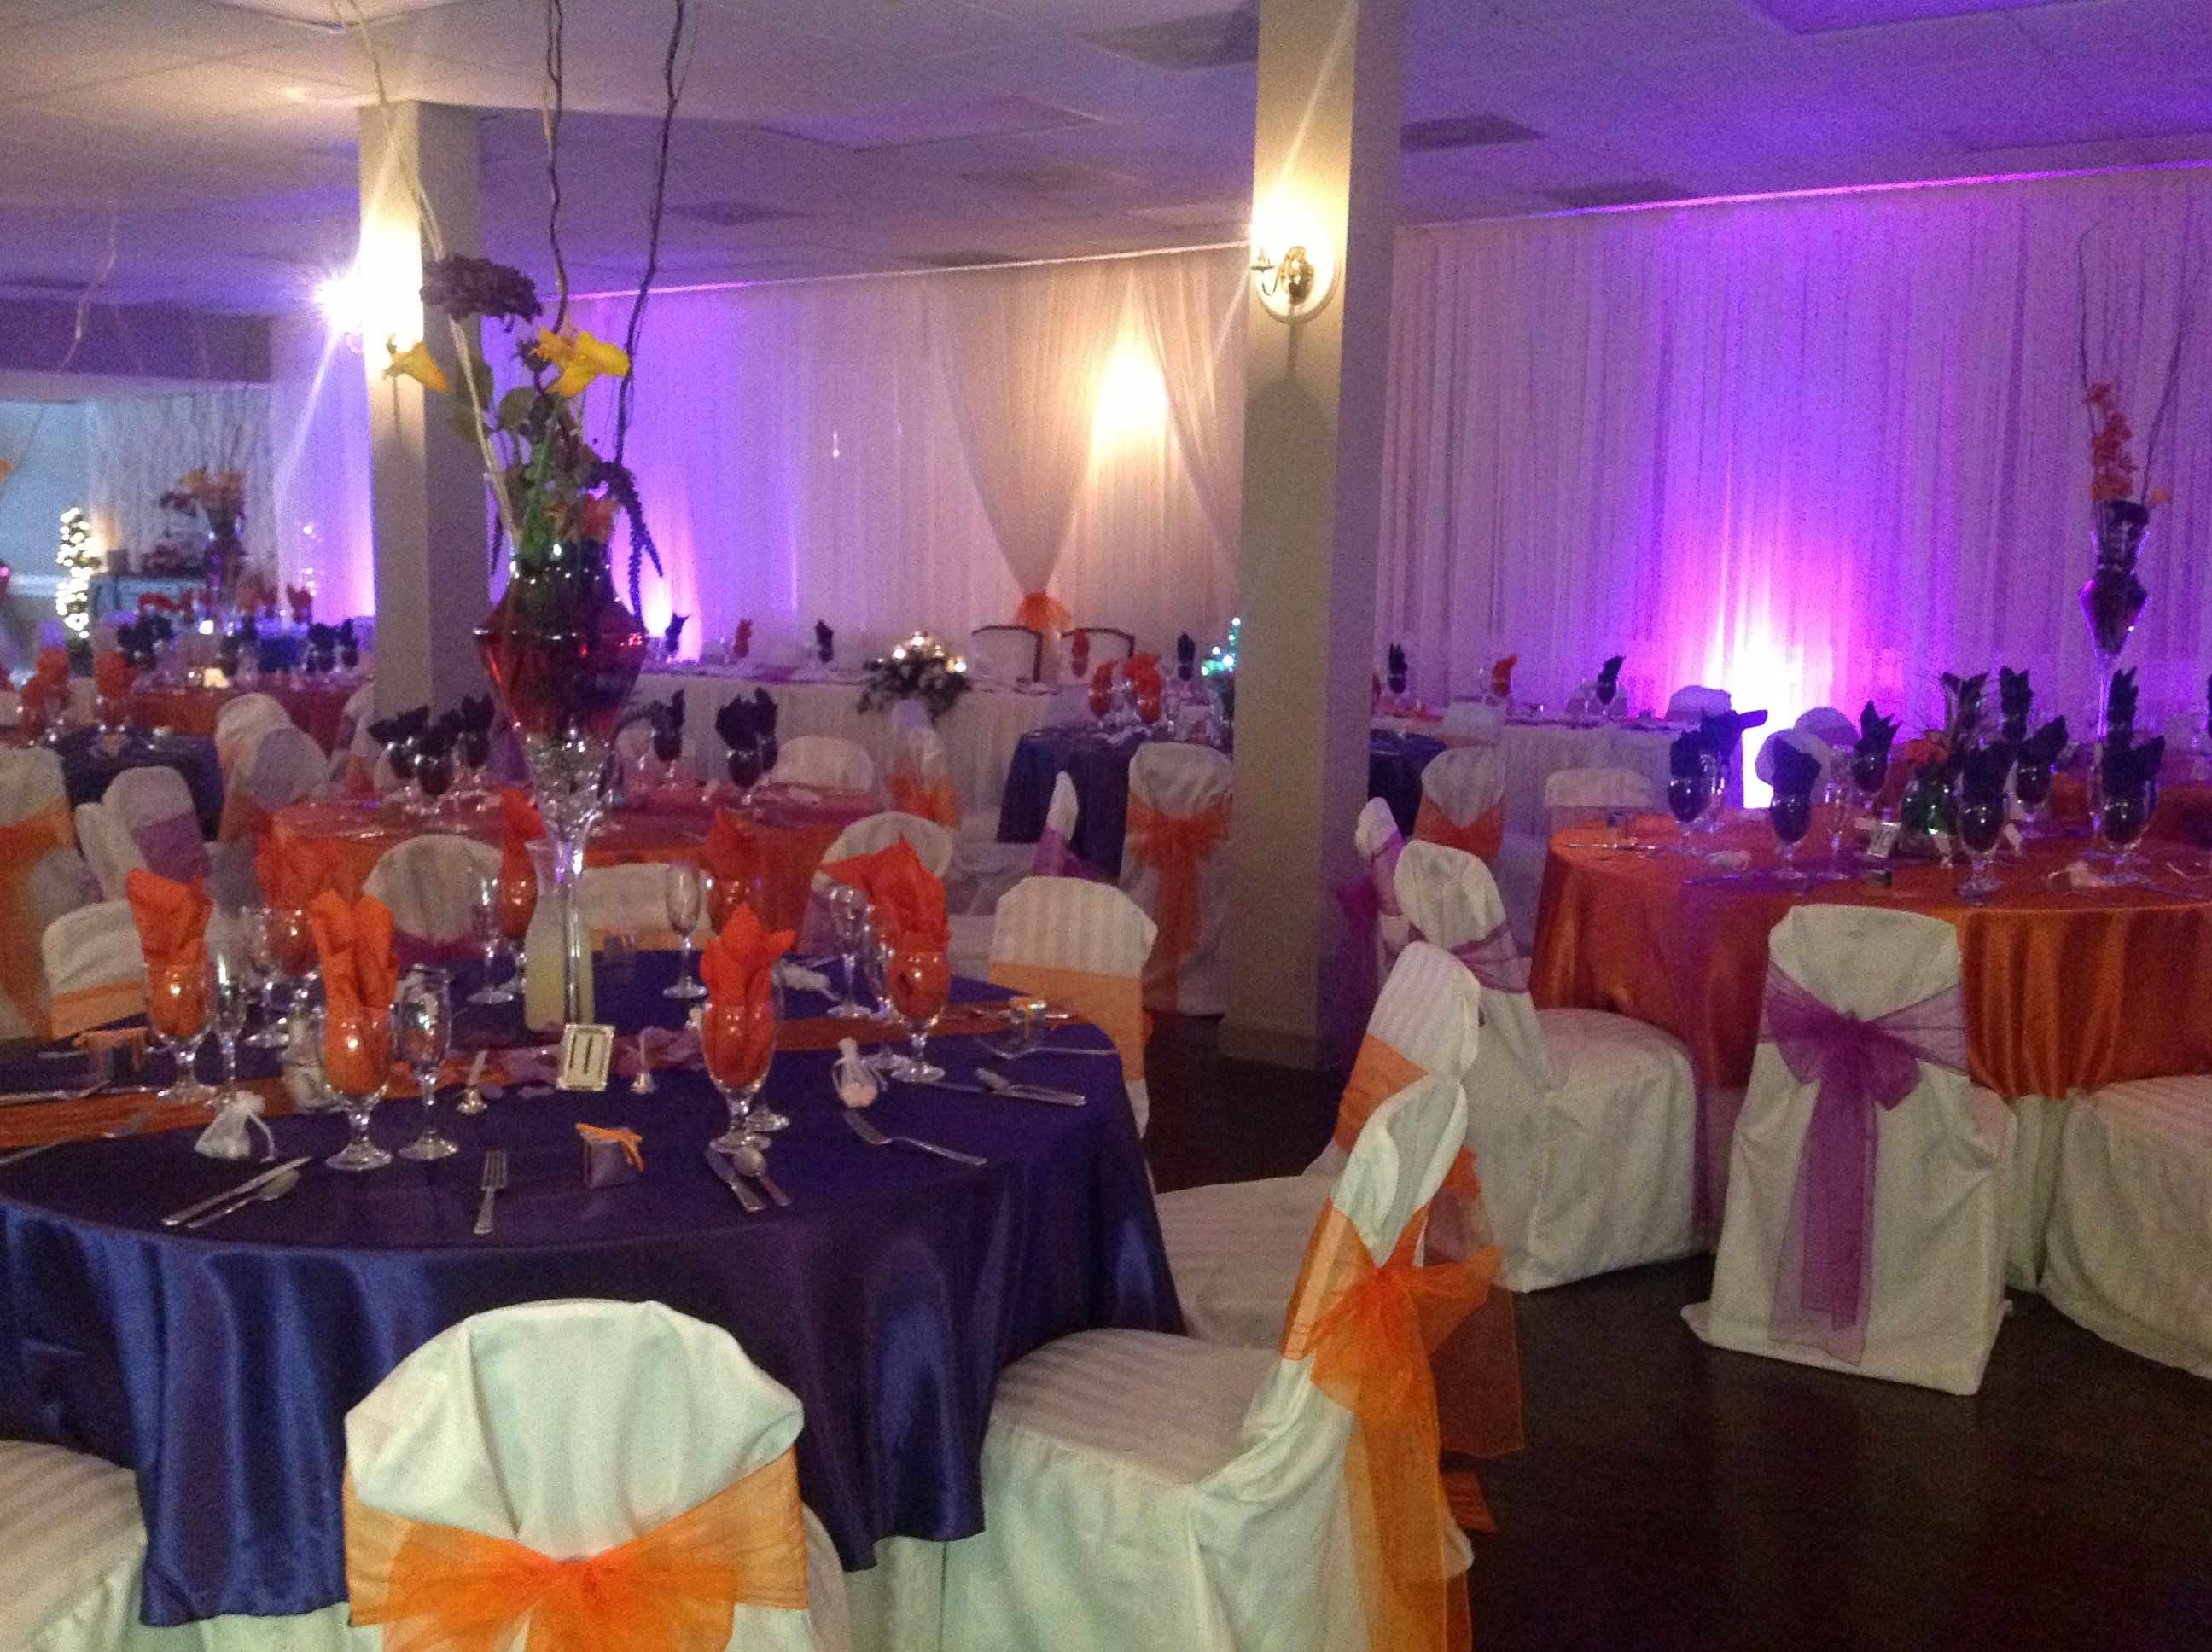 royal purple and burnt orange | Work Ideas | Pinterest | Willy wonka